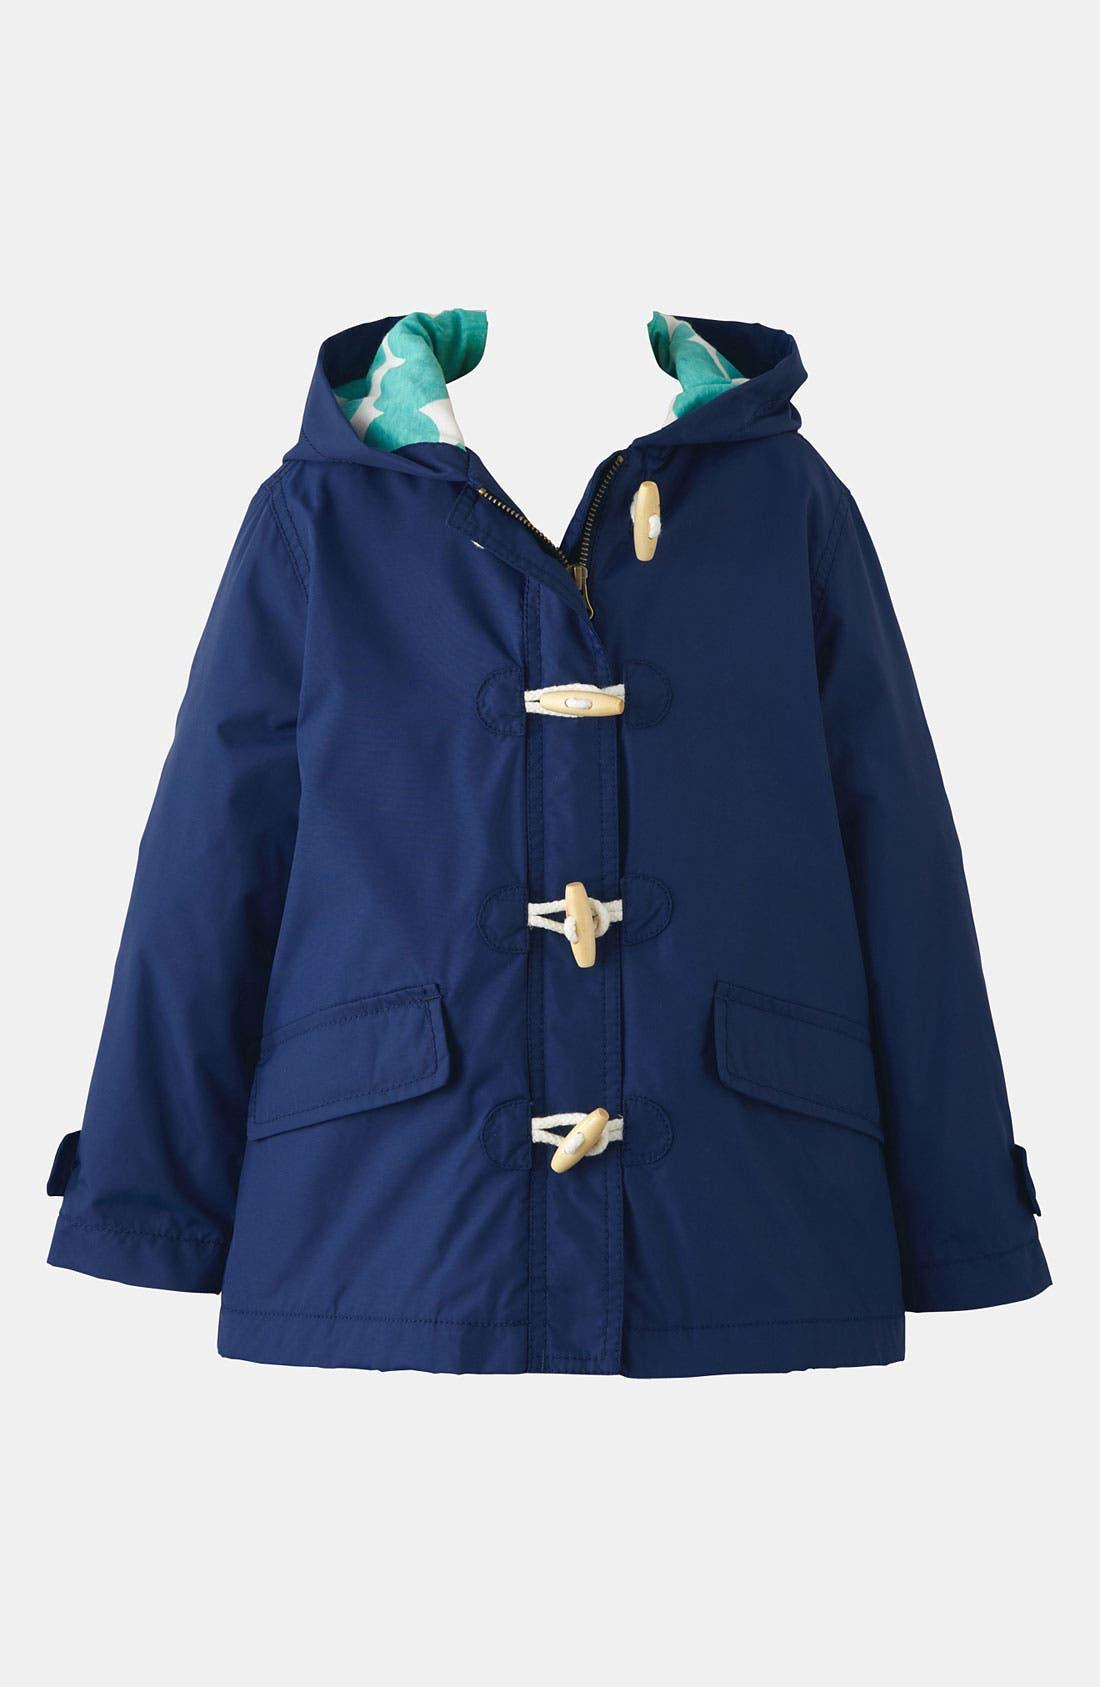 Main Image - Mini Boden 'Fisherman' Rain Jacket (Little Girls & Big Girls)